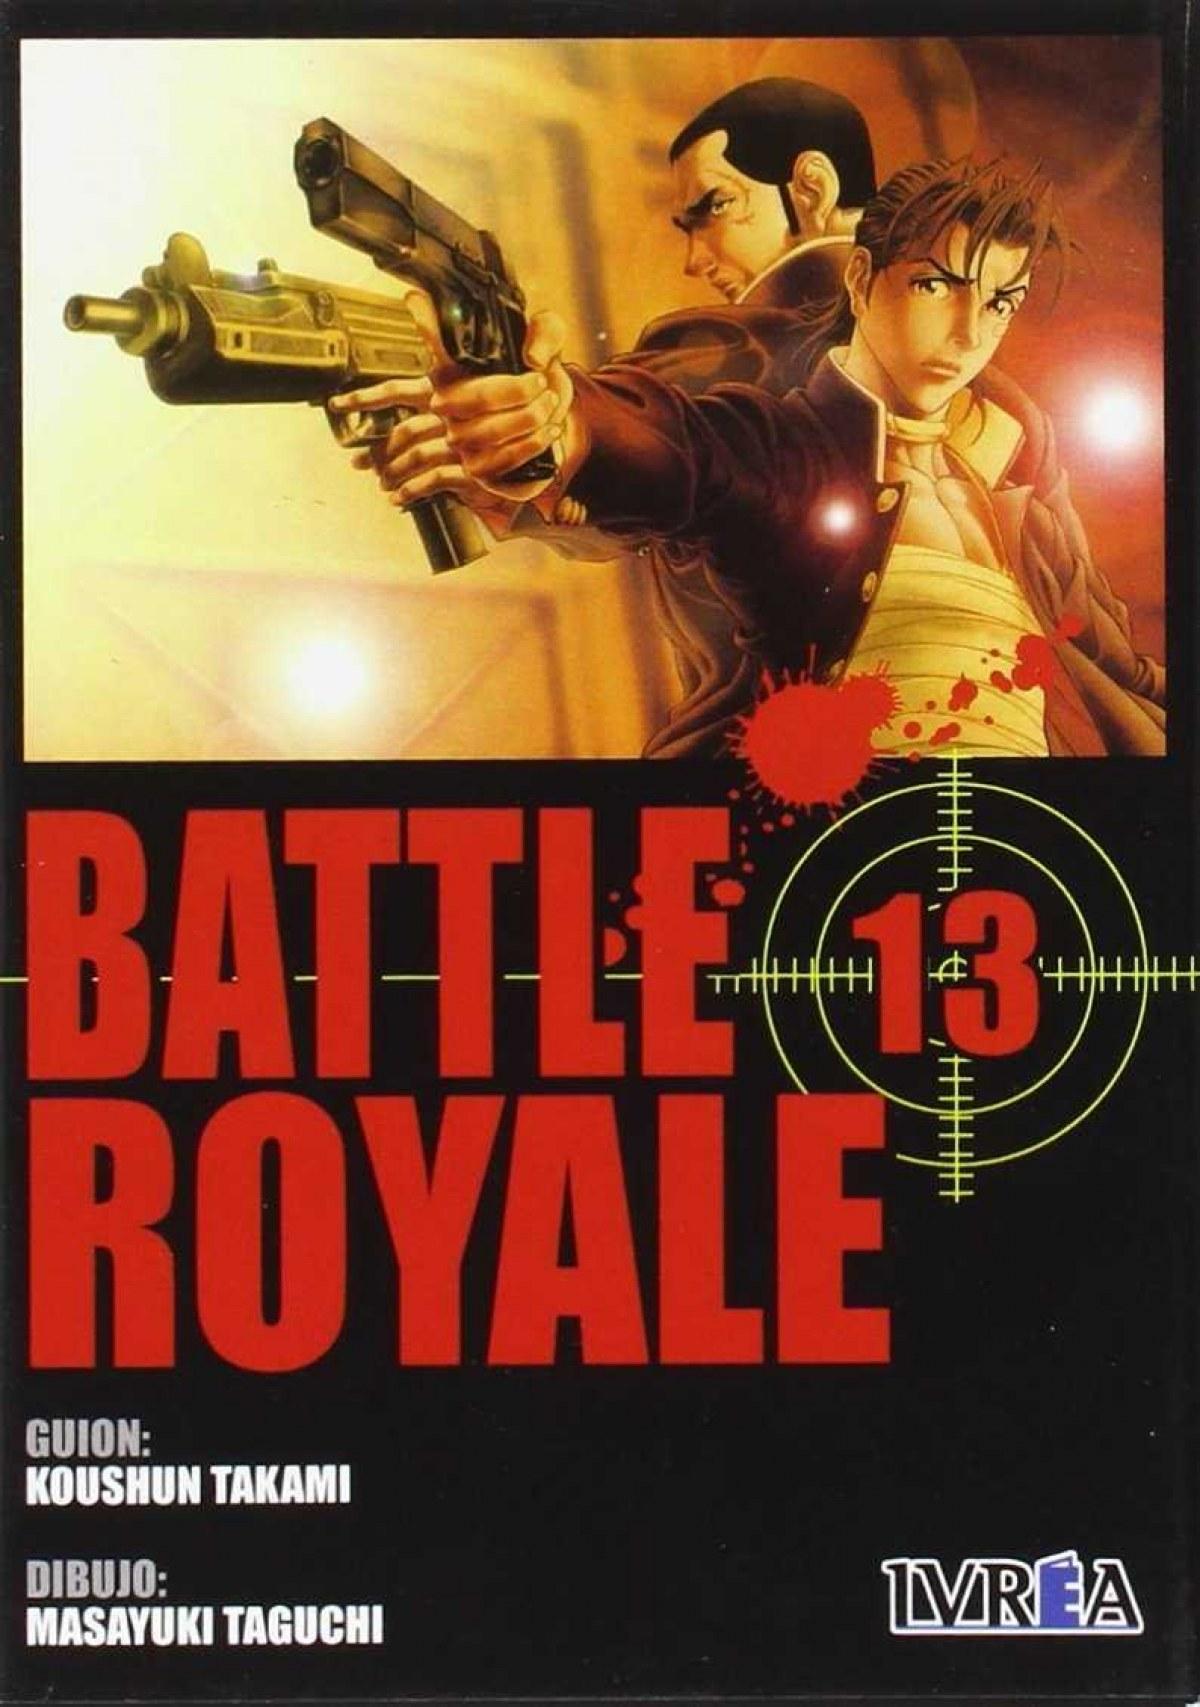 Battle Royale,13 - Takami, Koushun